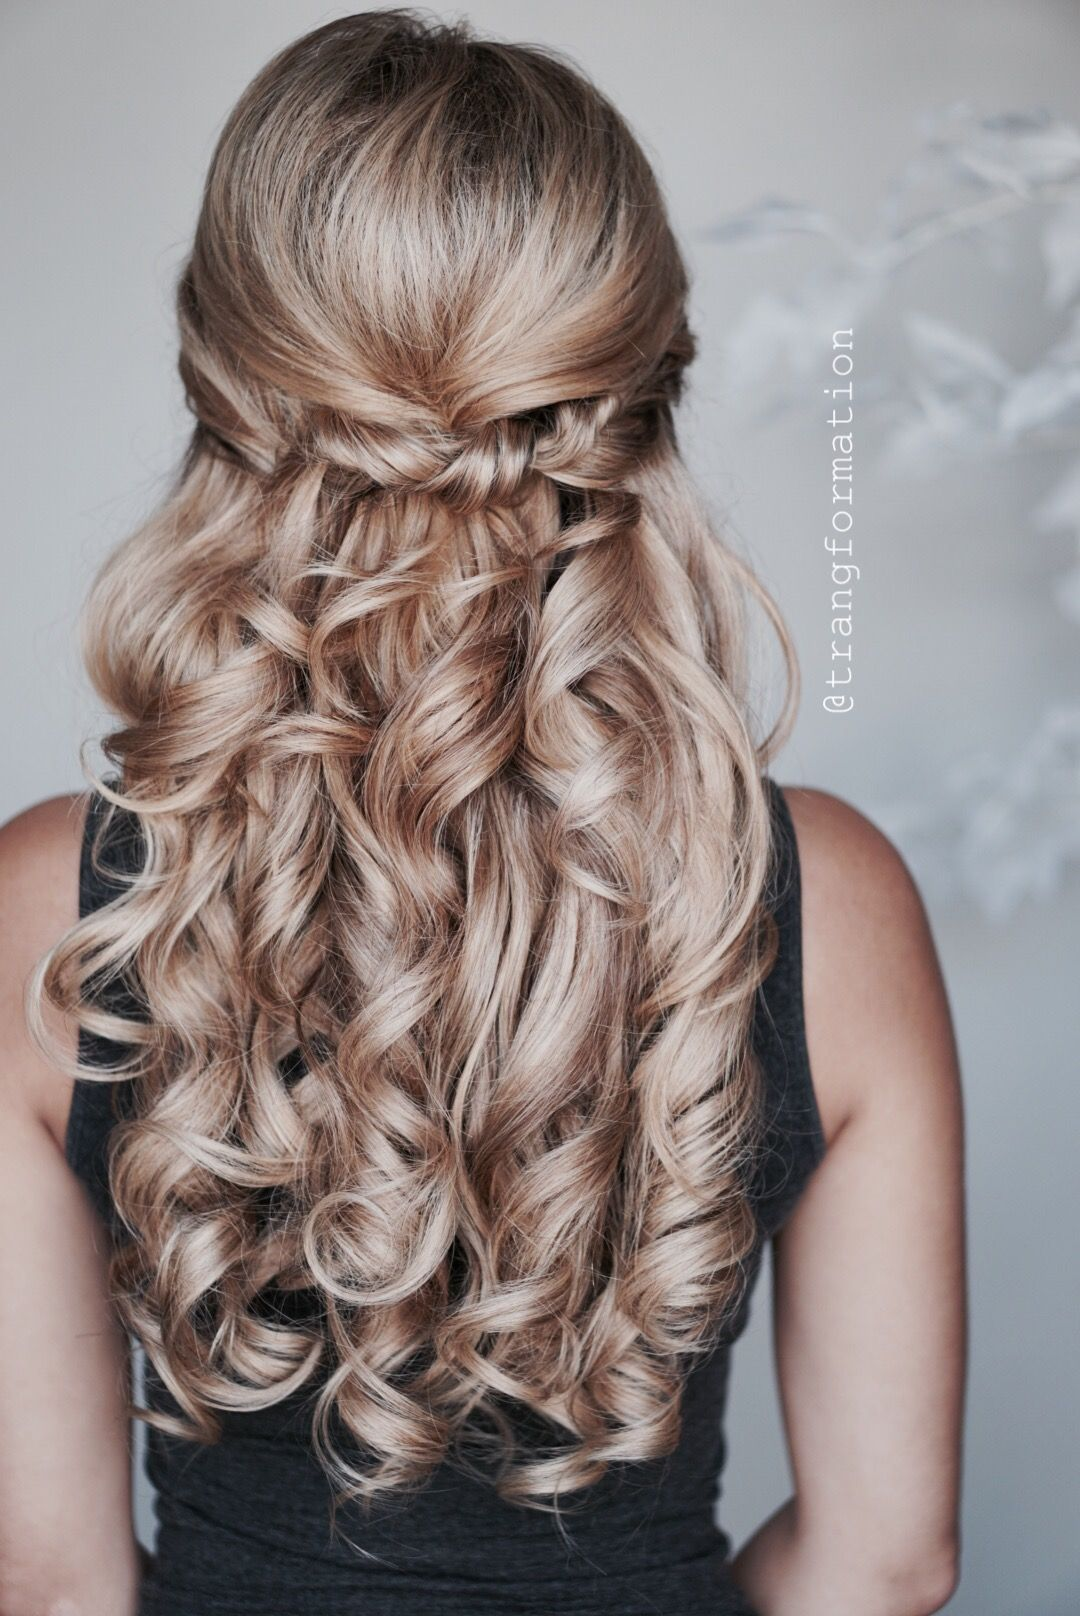 Wedding Hairstyles Bridal Hair Half Updo Half Up Half Down Over Hairstylist Www Trangdo Net Down Hairstyles Down Hairstyles For Long Hair Hair Styles